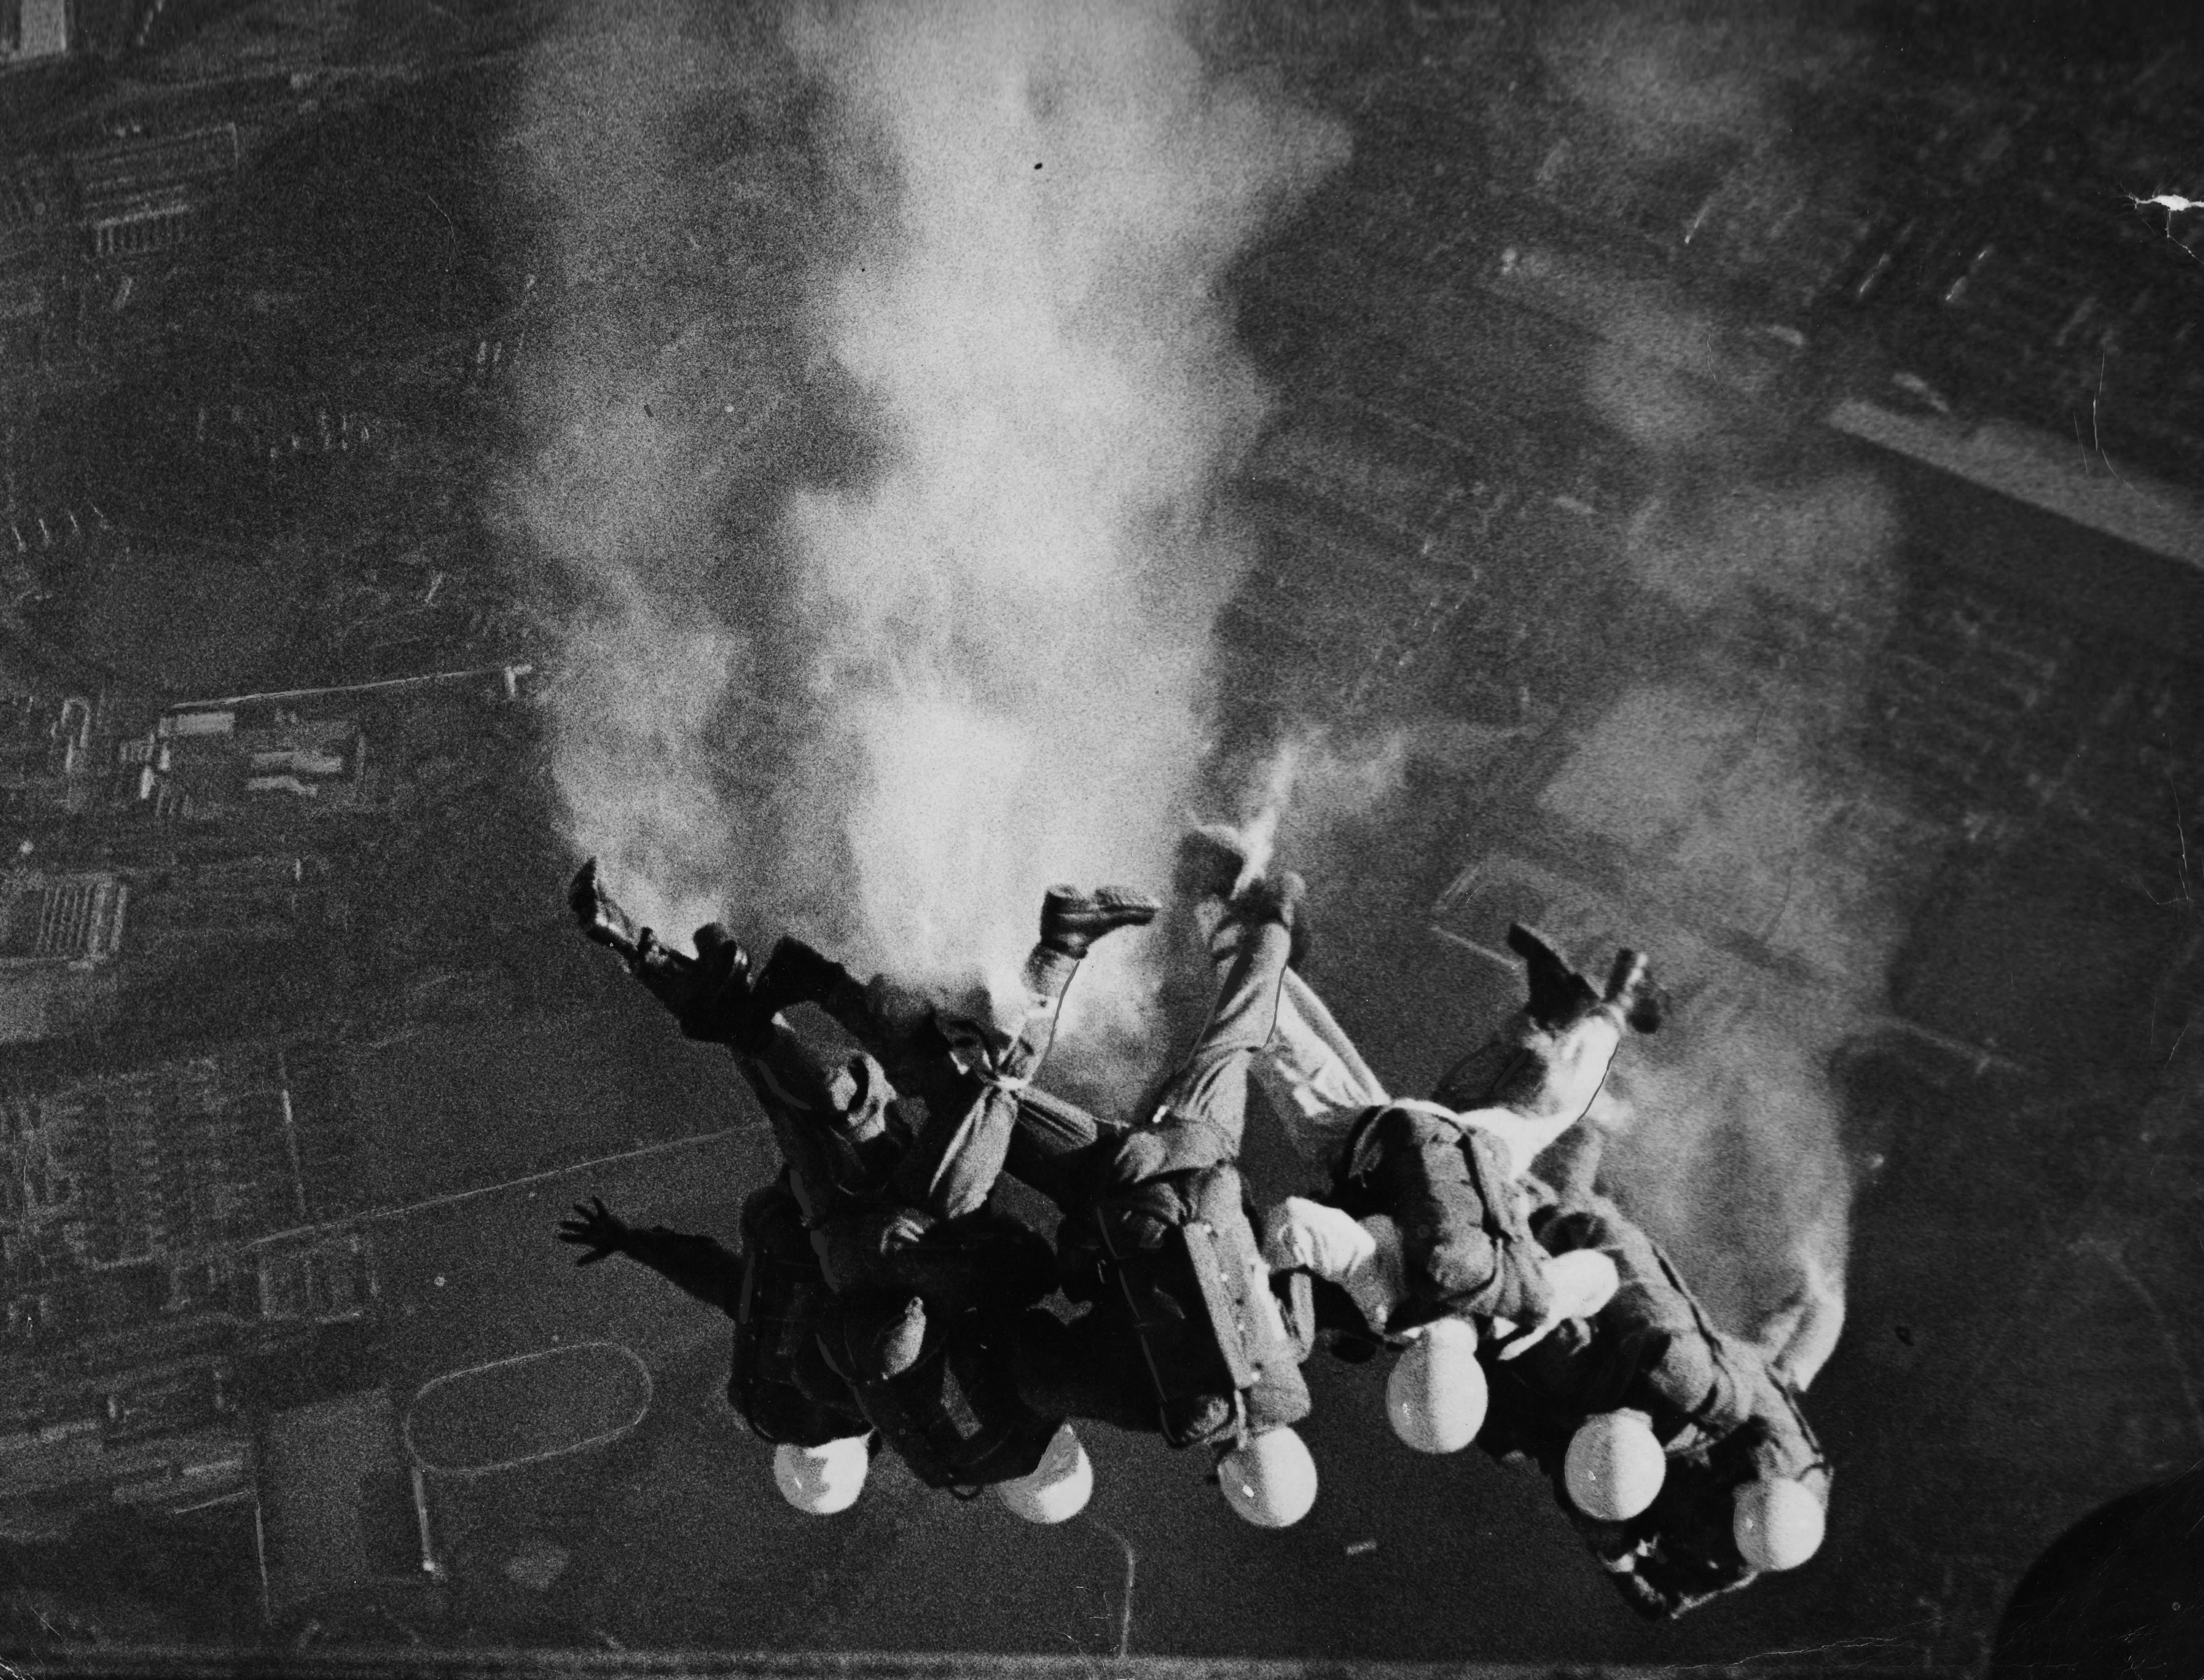 FARNBOROUGH 1961 SMOKE EXIT